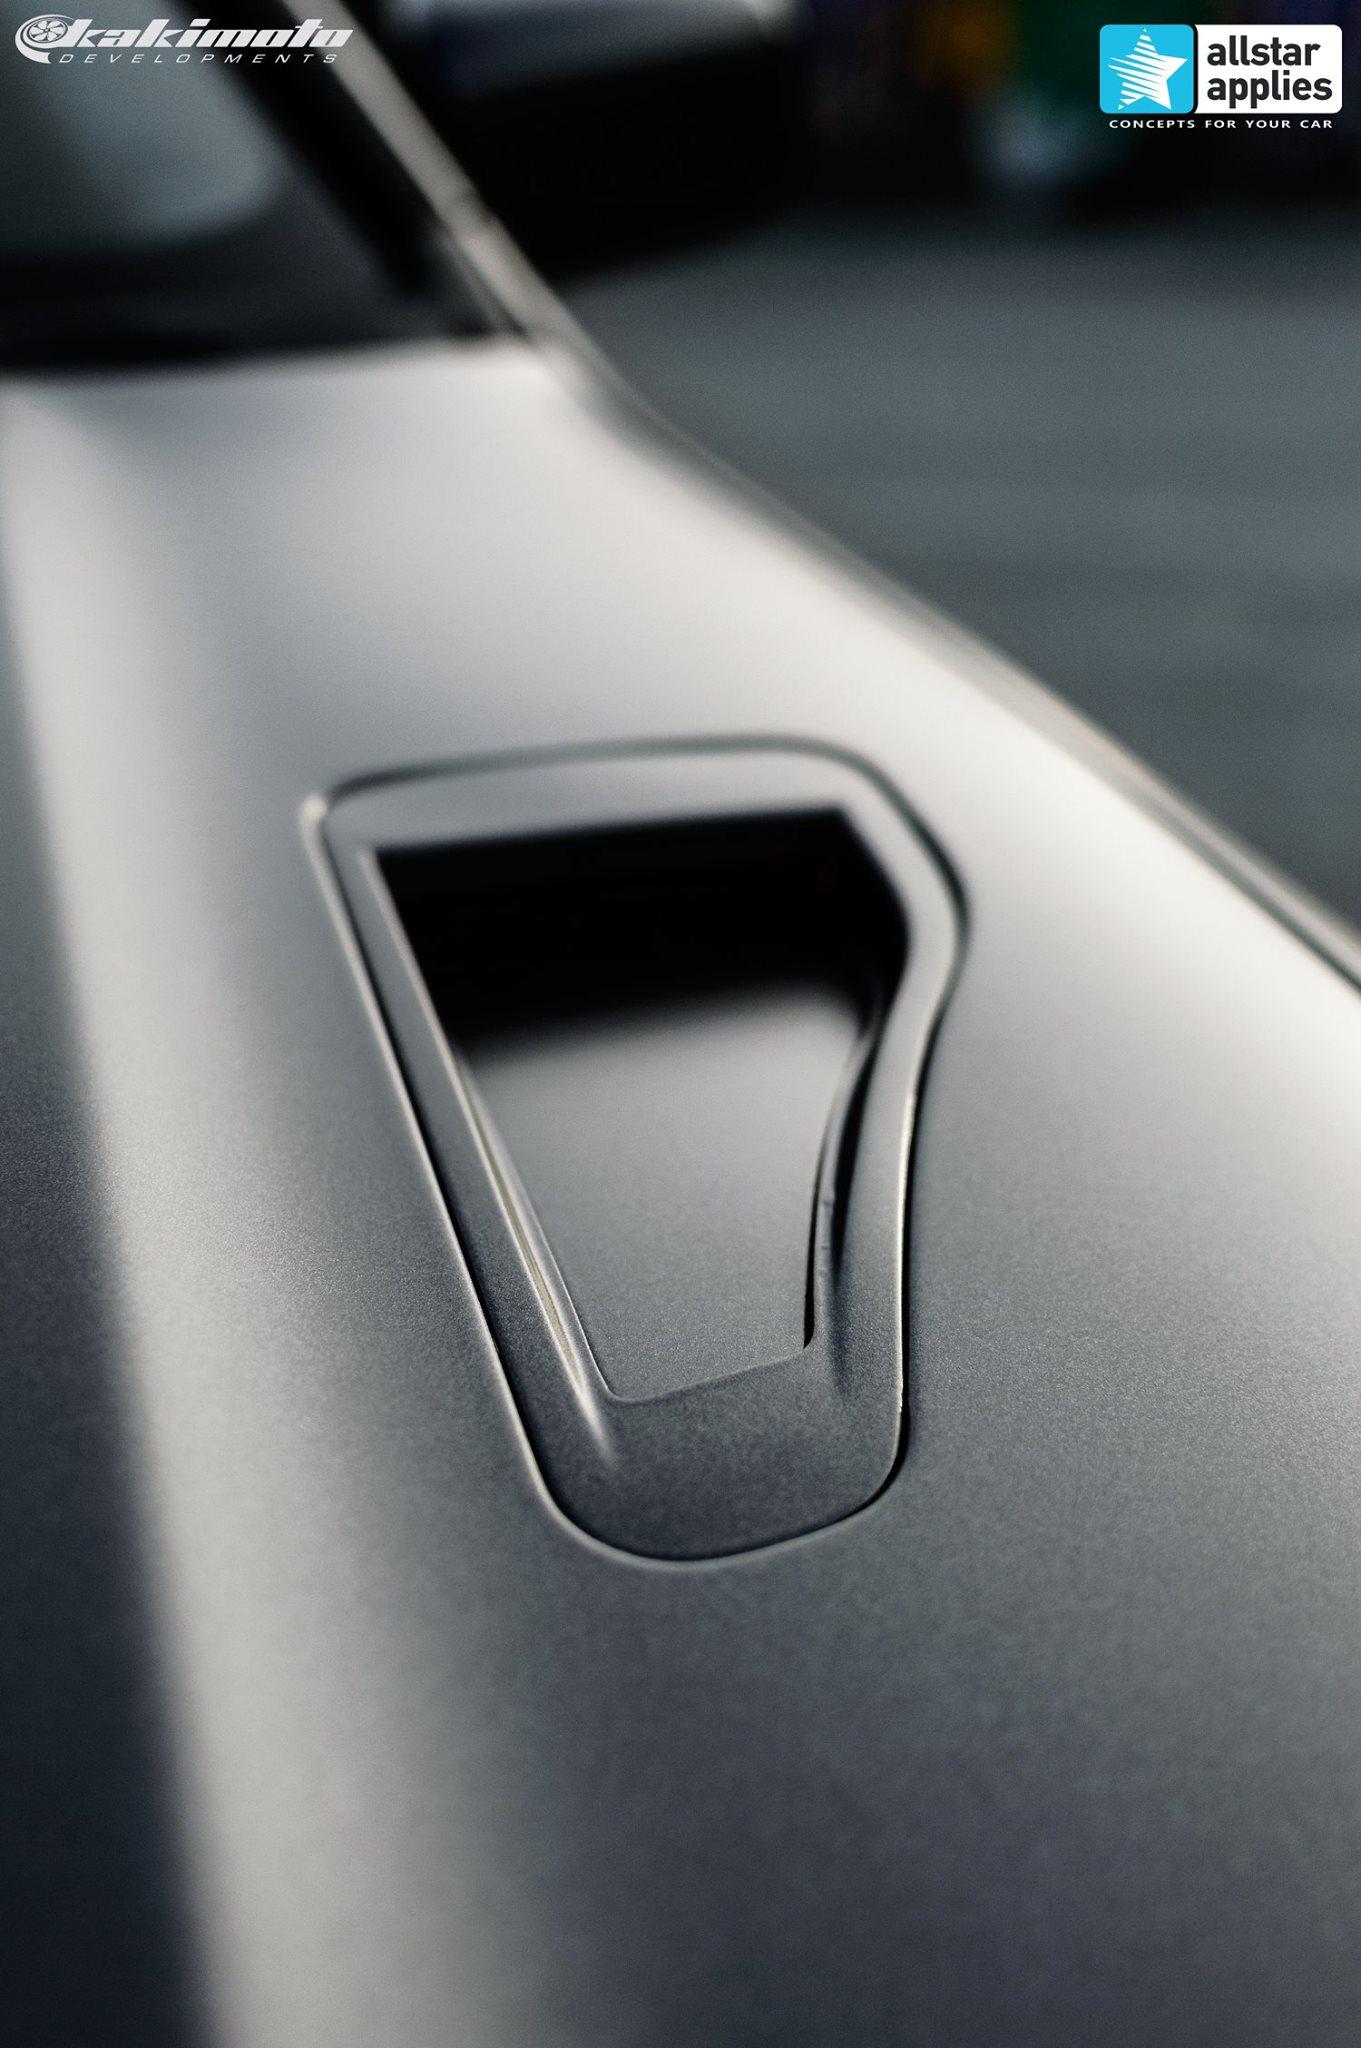 Mitsubishi Evo 7 - Honeycomb Design (11)